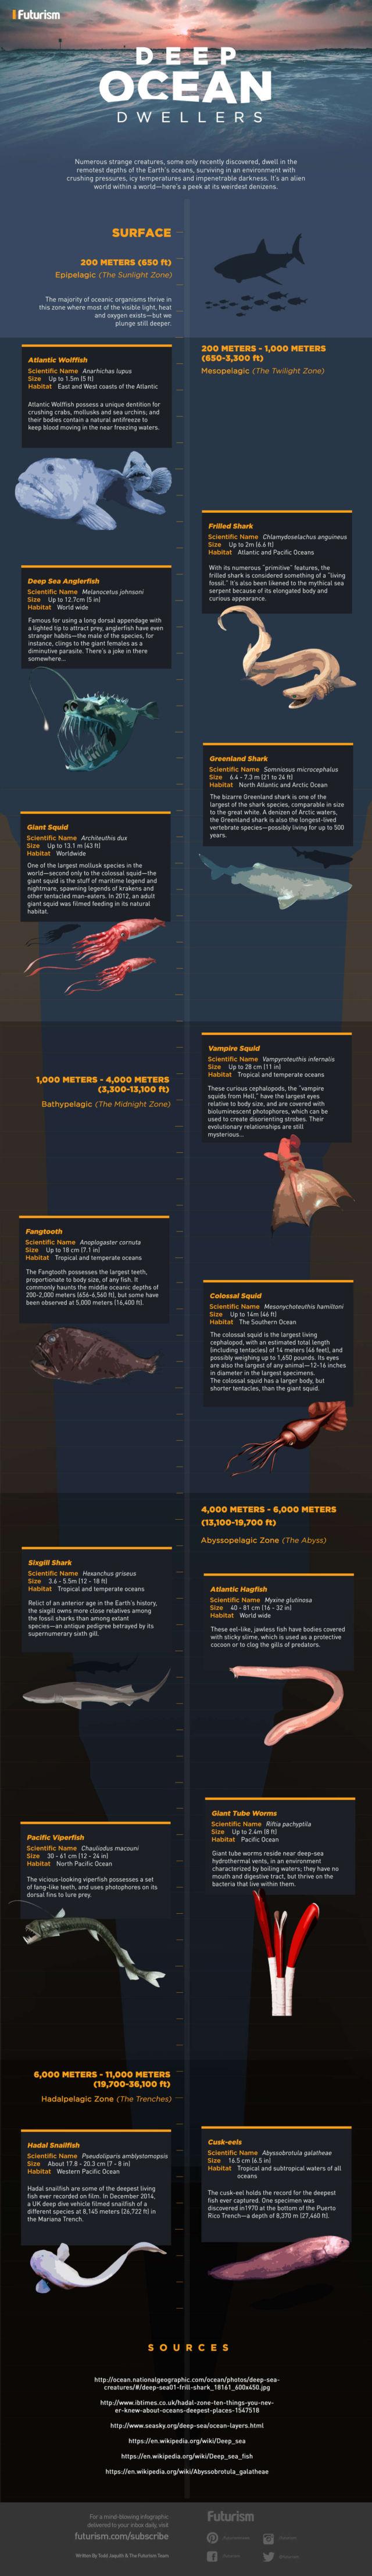 Deep Ocean Dwellers - infographic